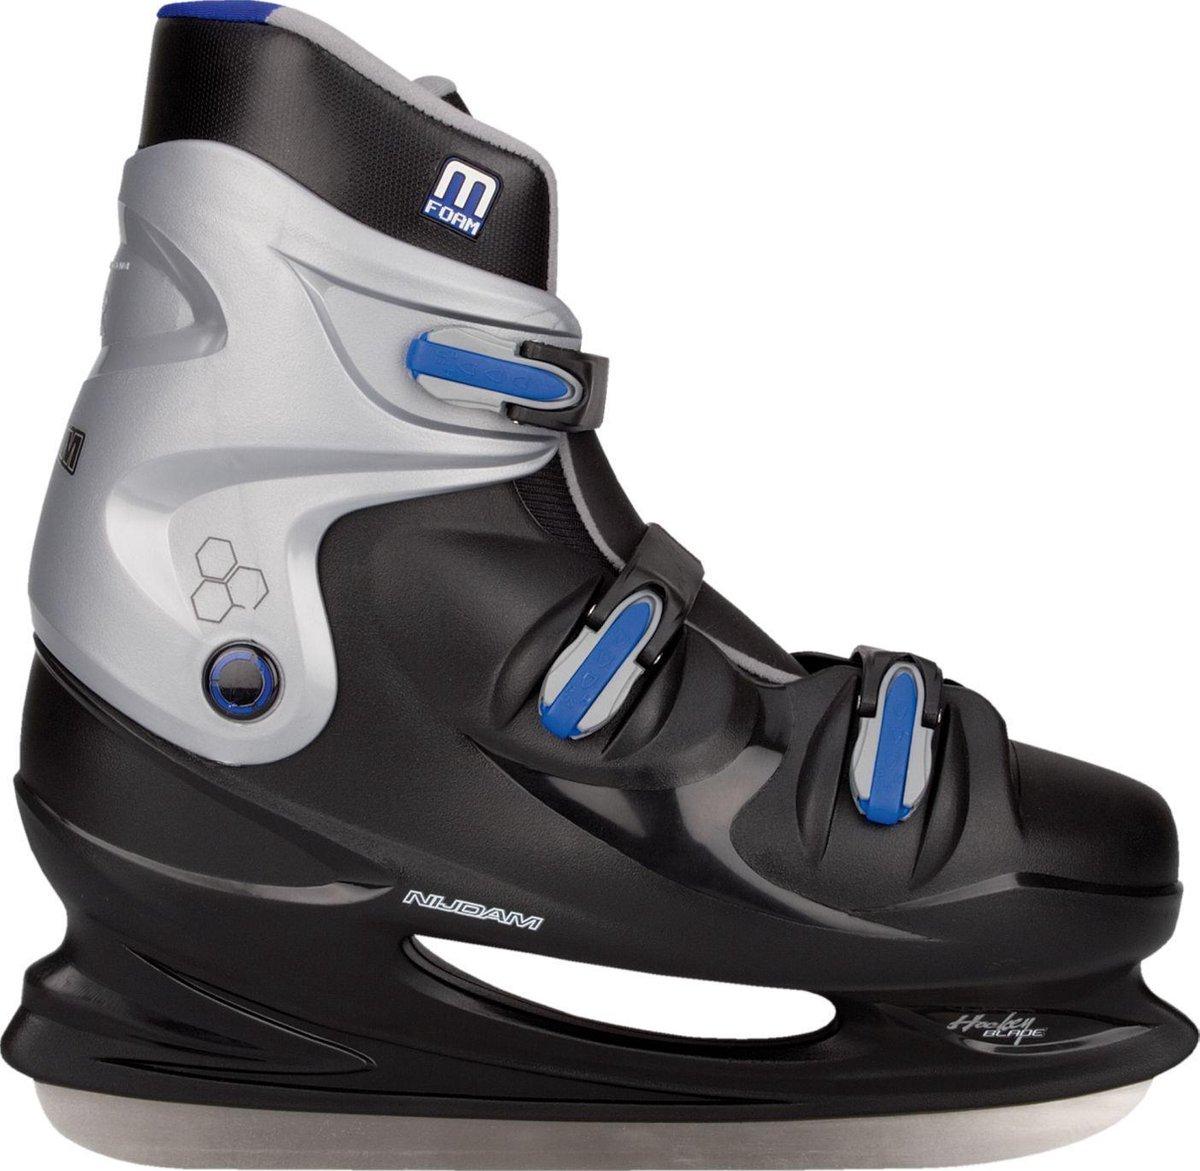 Nijdam IJshockeyschaats XXL - Hardboot - Zwart/Zilver/Blauw - 47